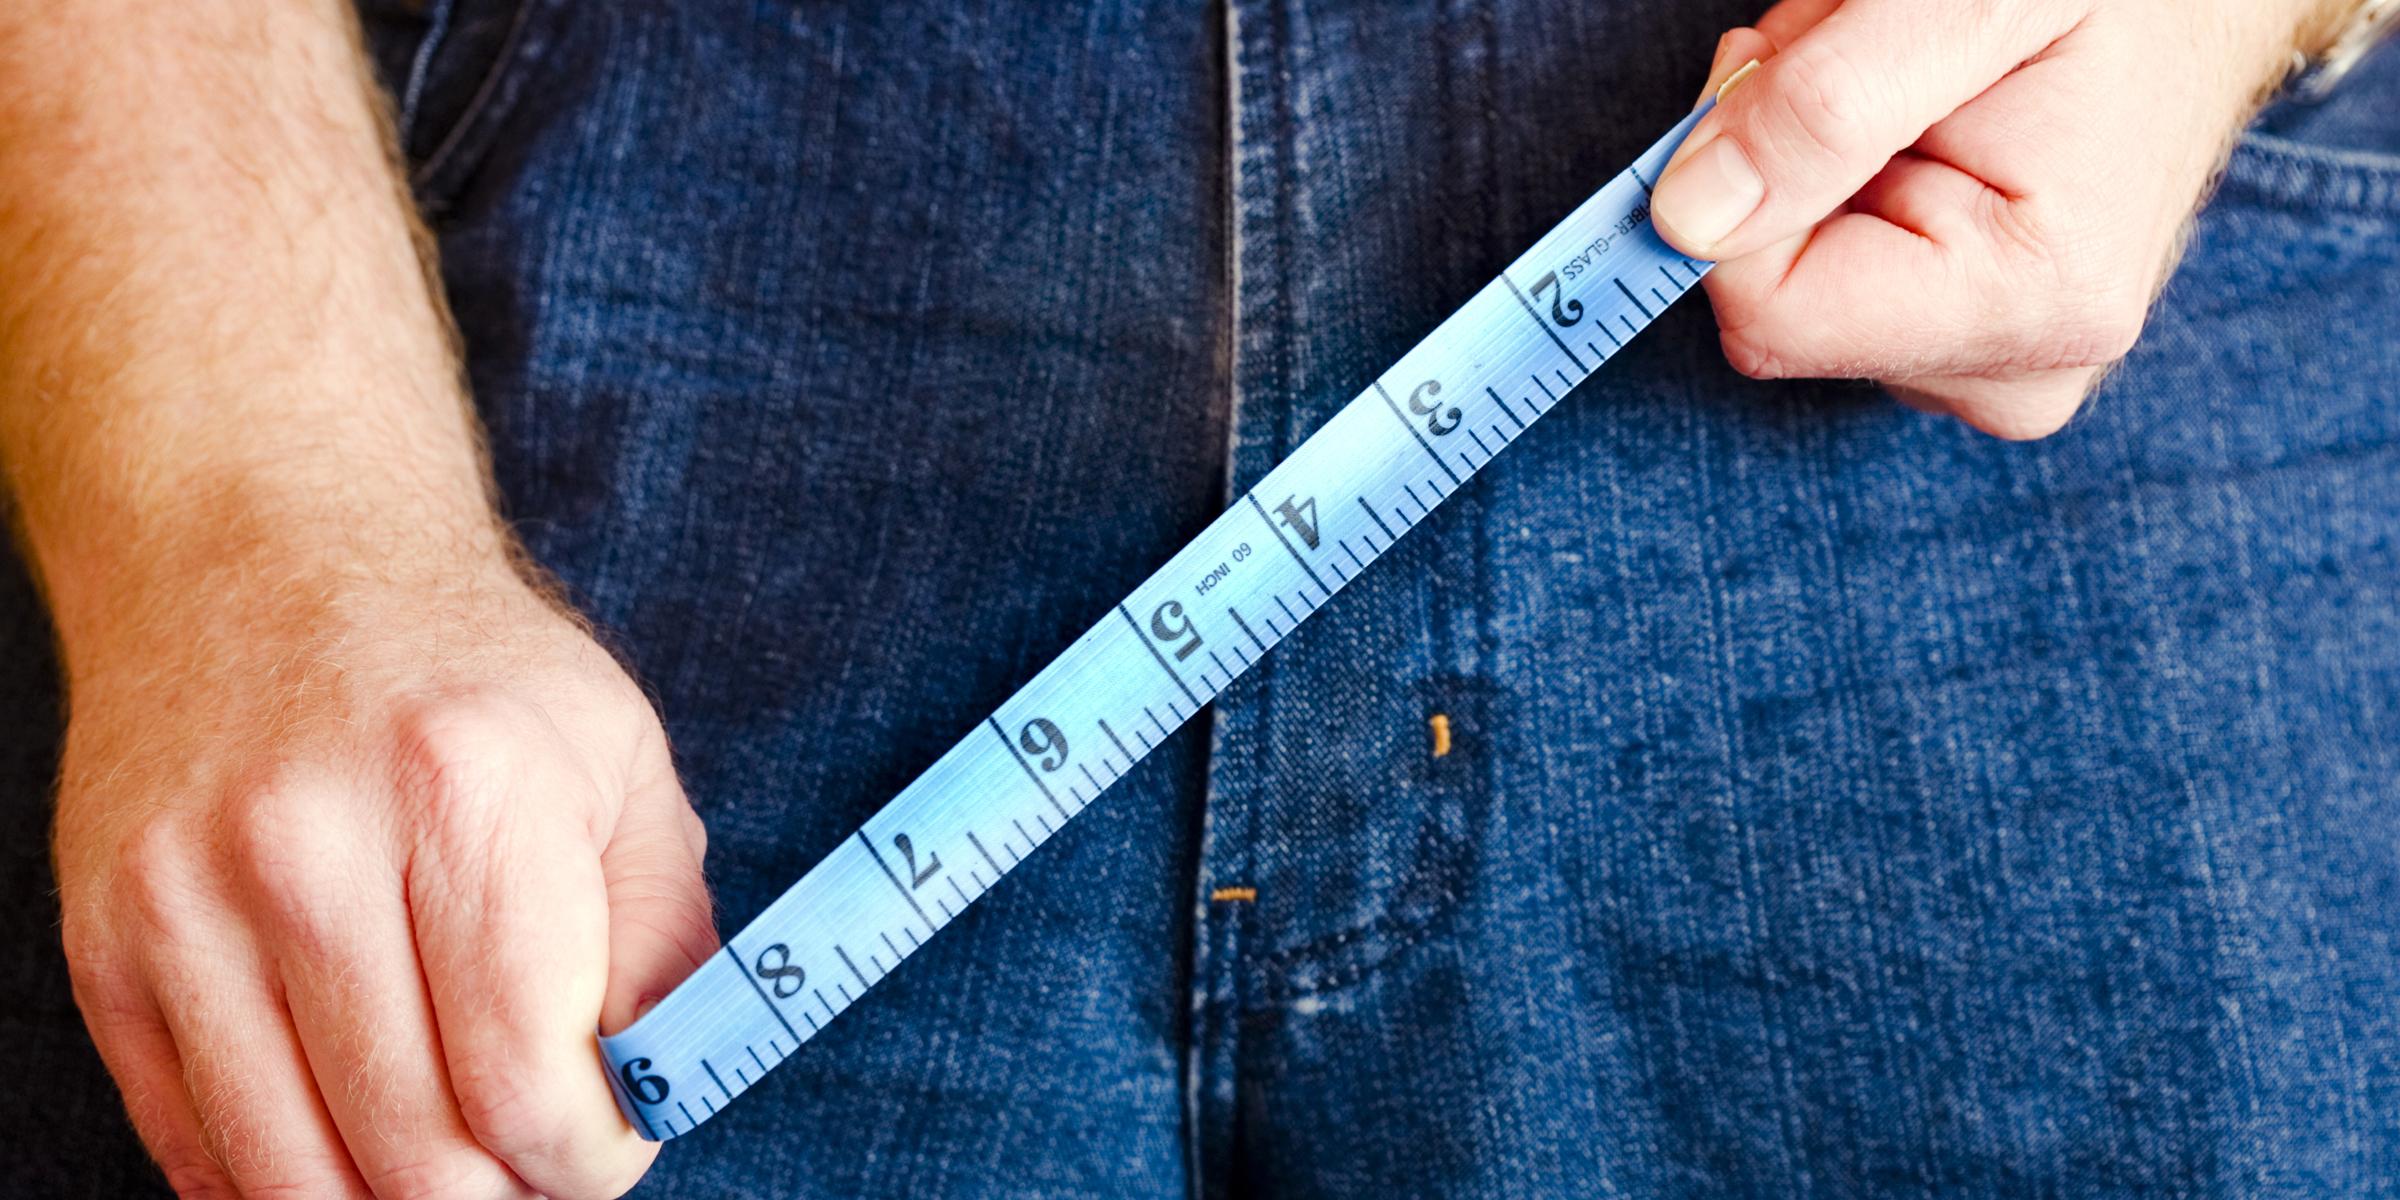 átlagos pénisz súlya